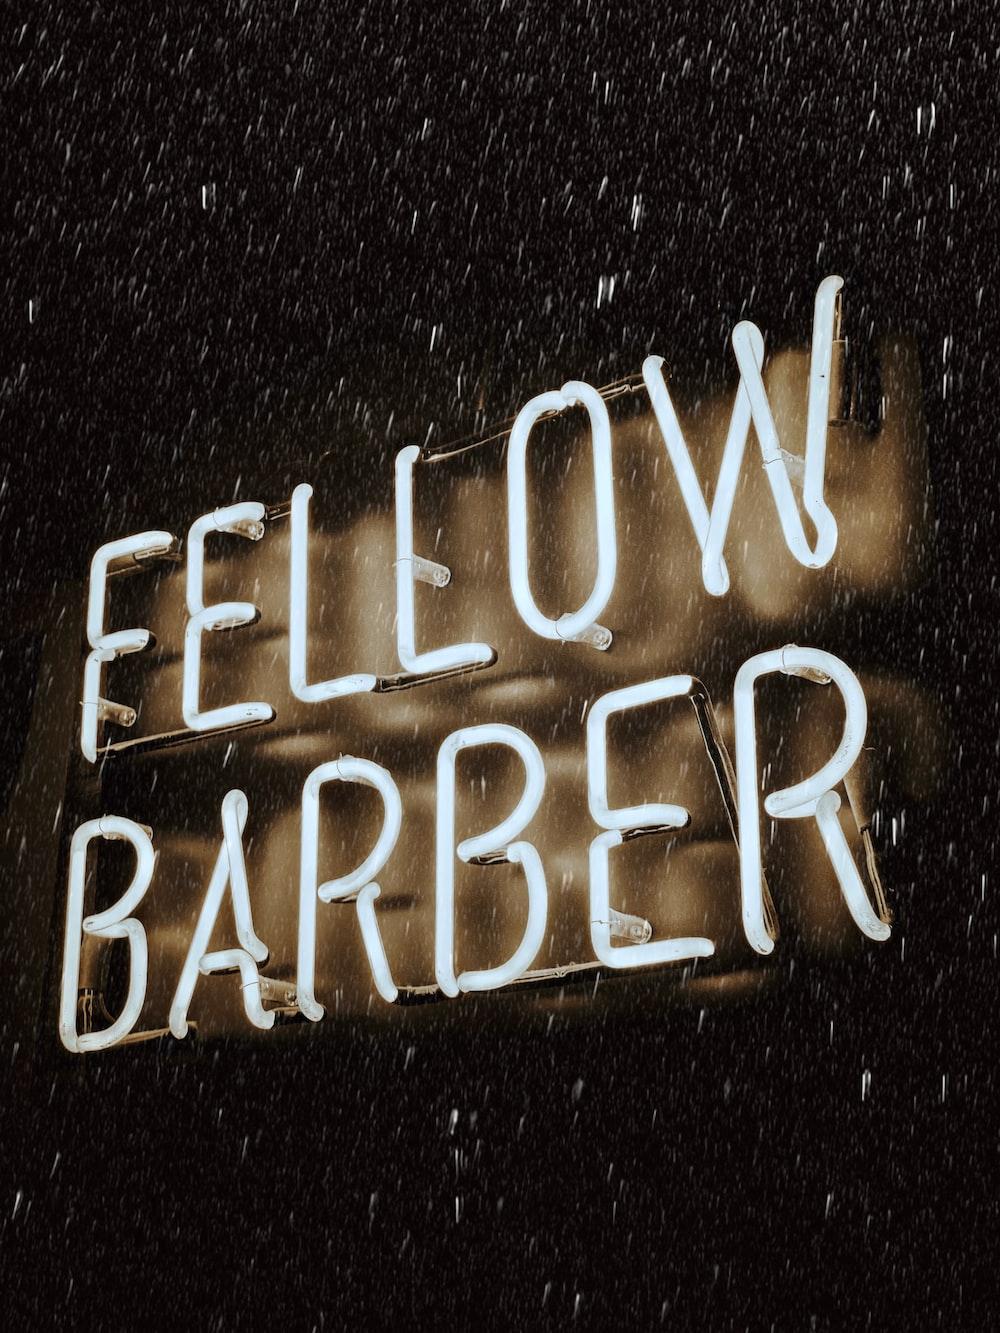 Fellow Barber neon sign